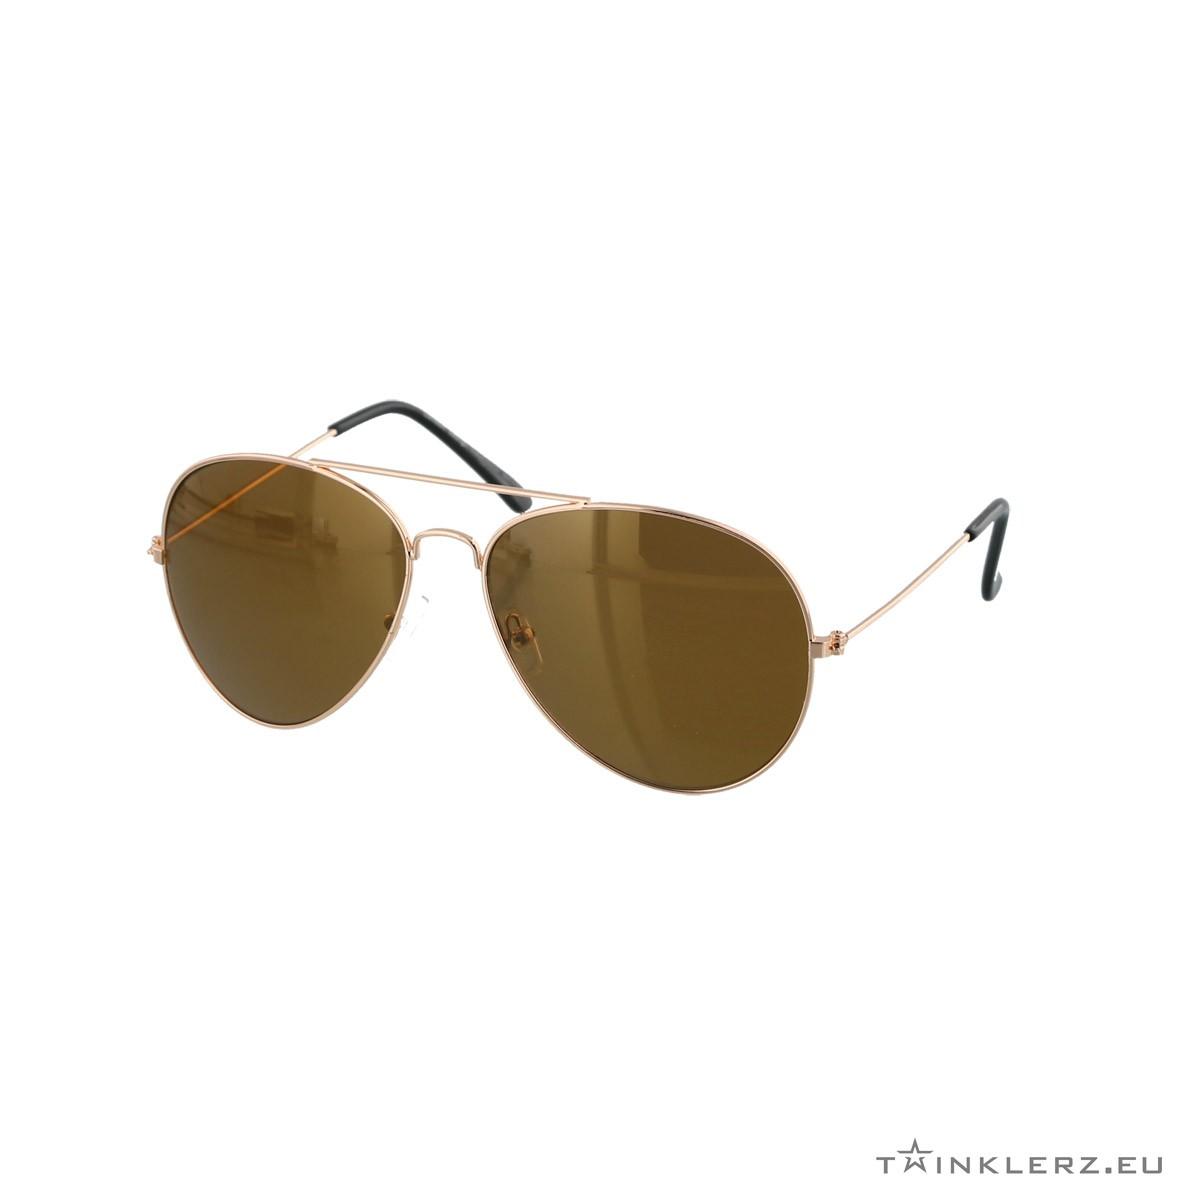 Brown gold aviator sunglasses